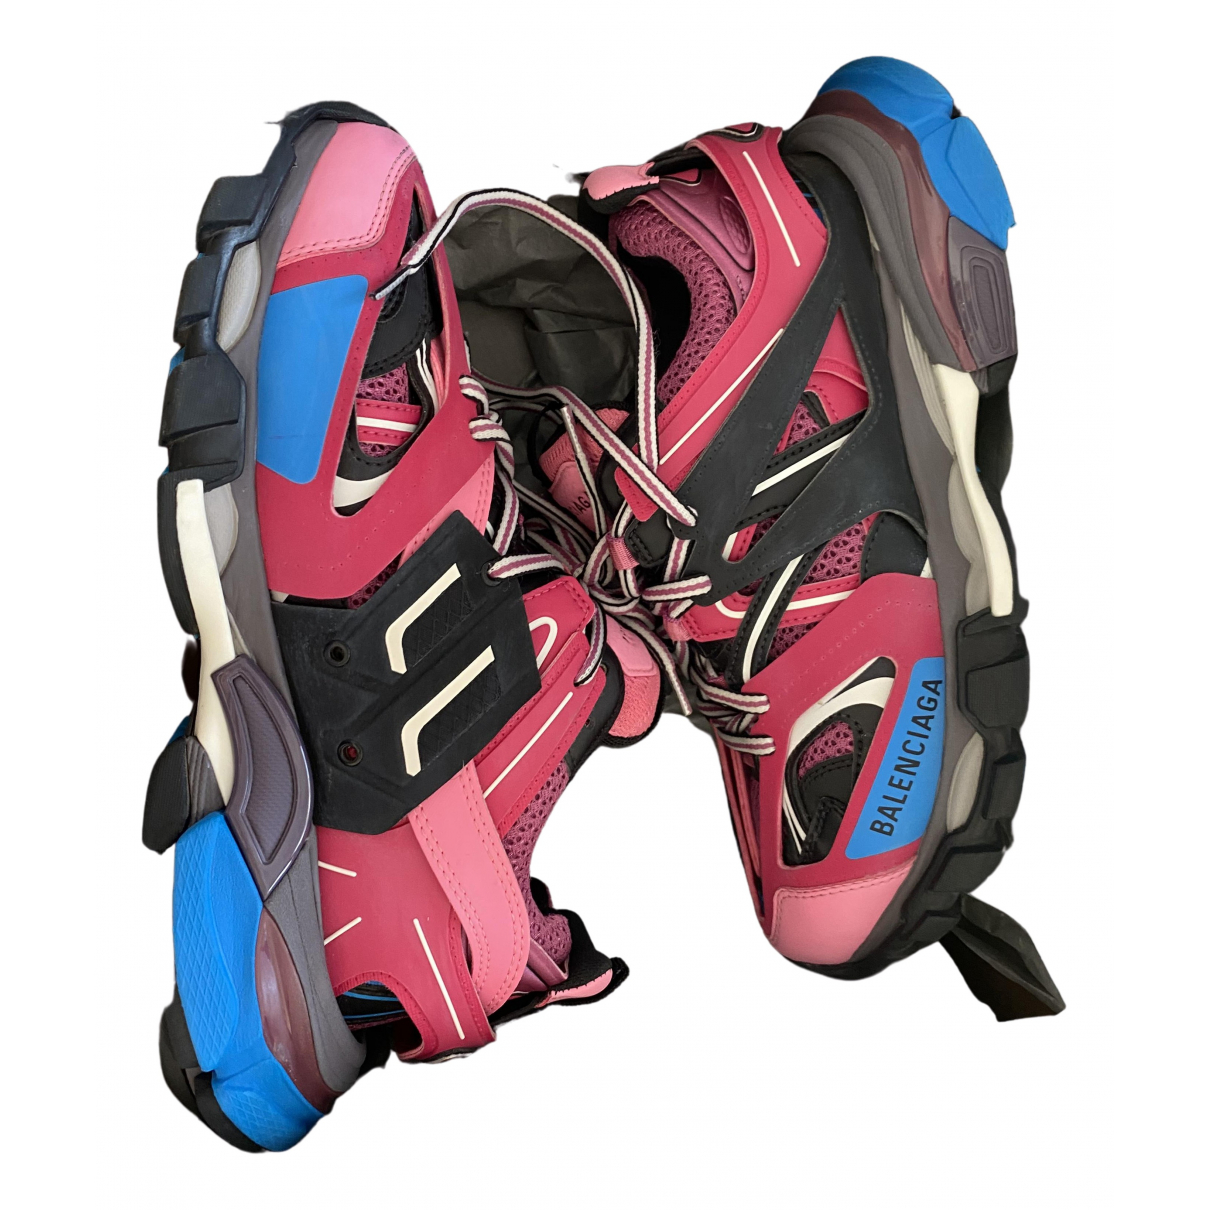 Balenciaga - Baskets Track pour femme en cuir verni - rose